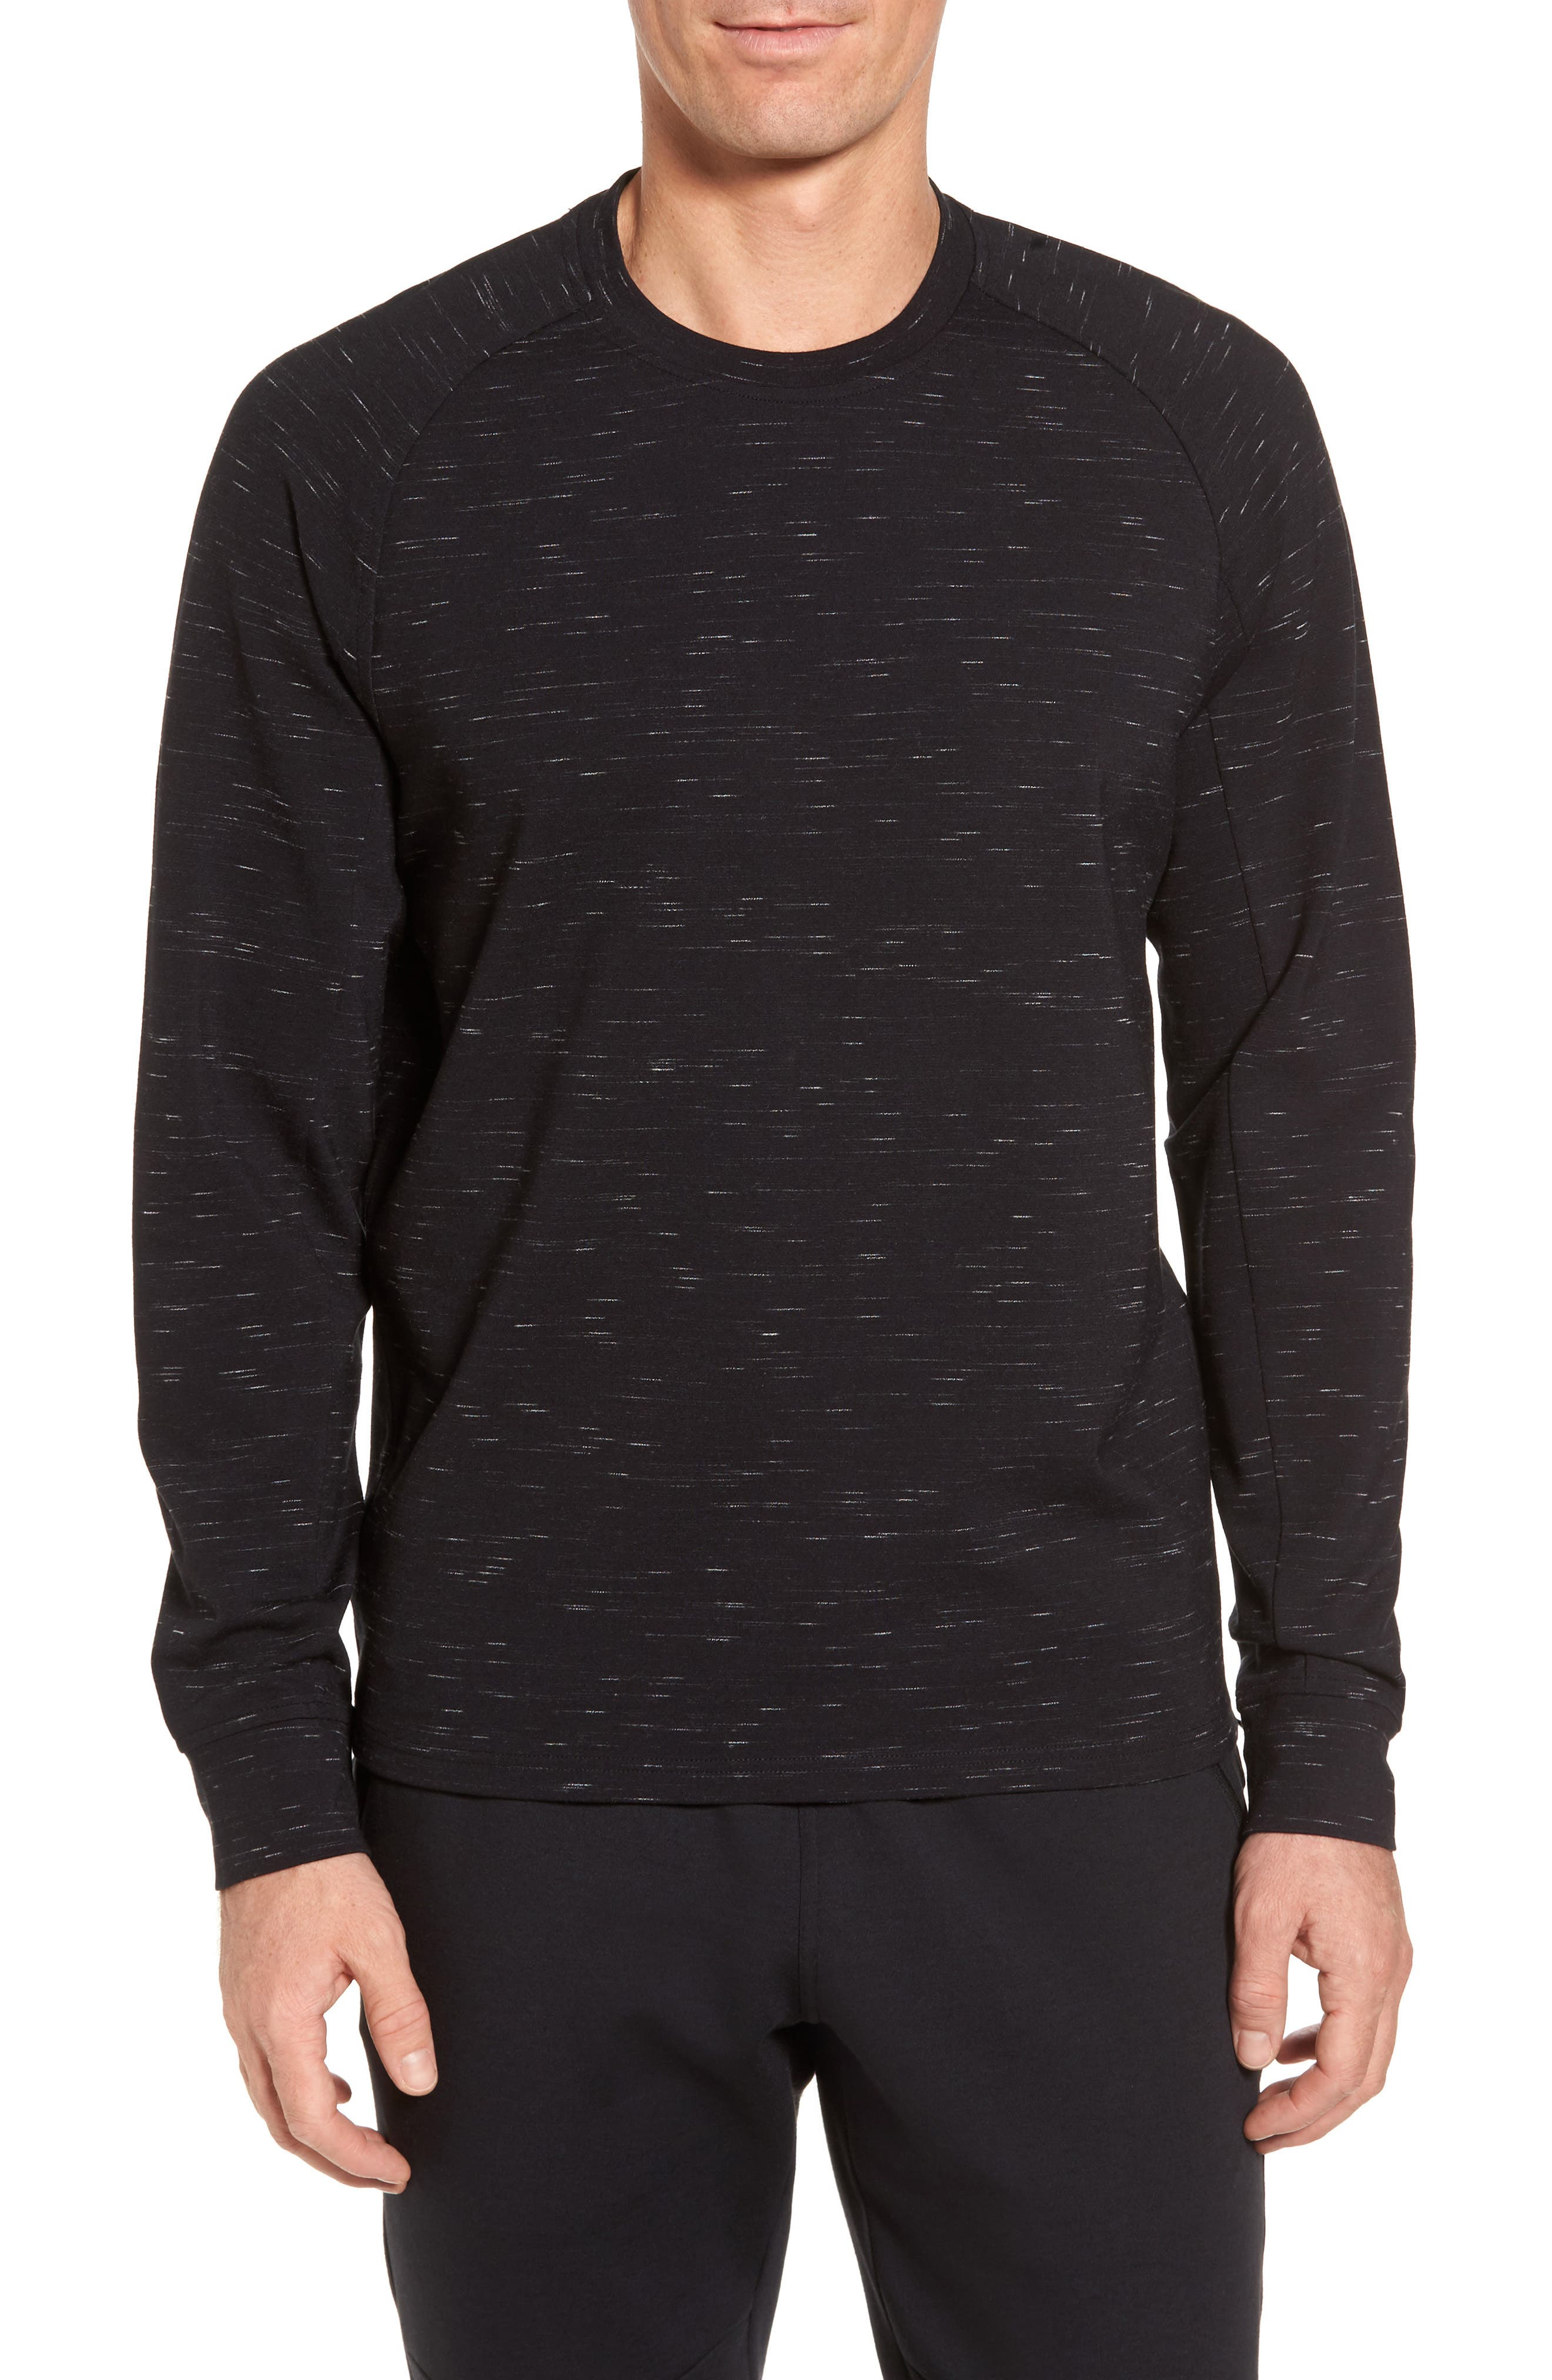 Alternate Image 1 Selected - Smartwool Merino 250 Base Layer Pattern Crewneck T-Shirt